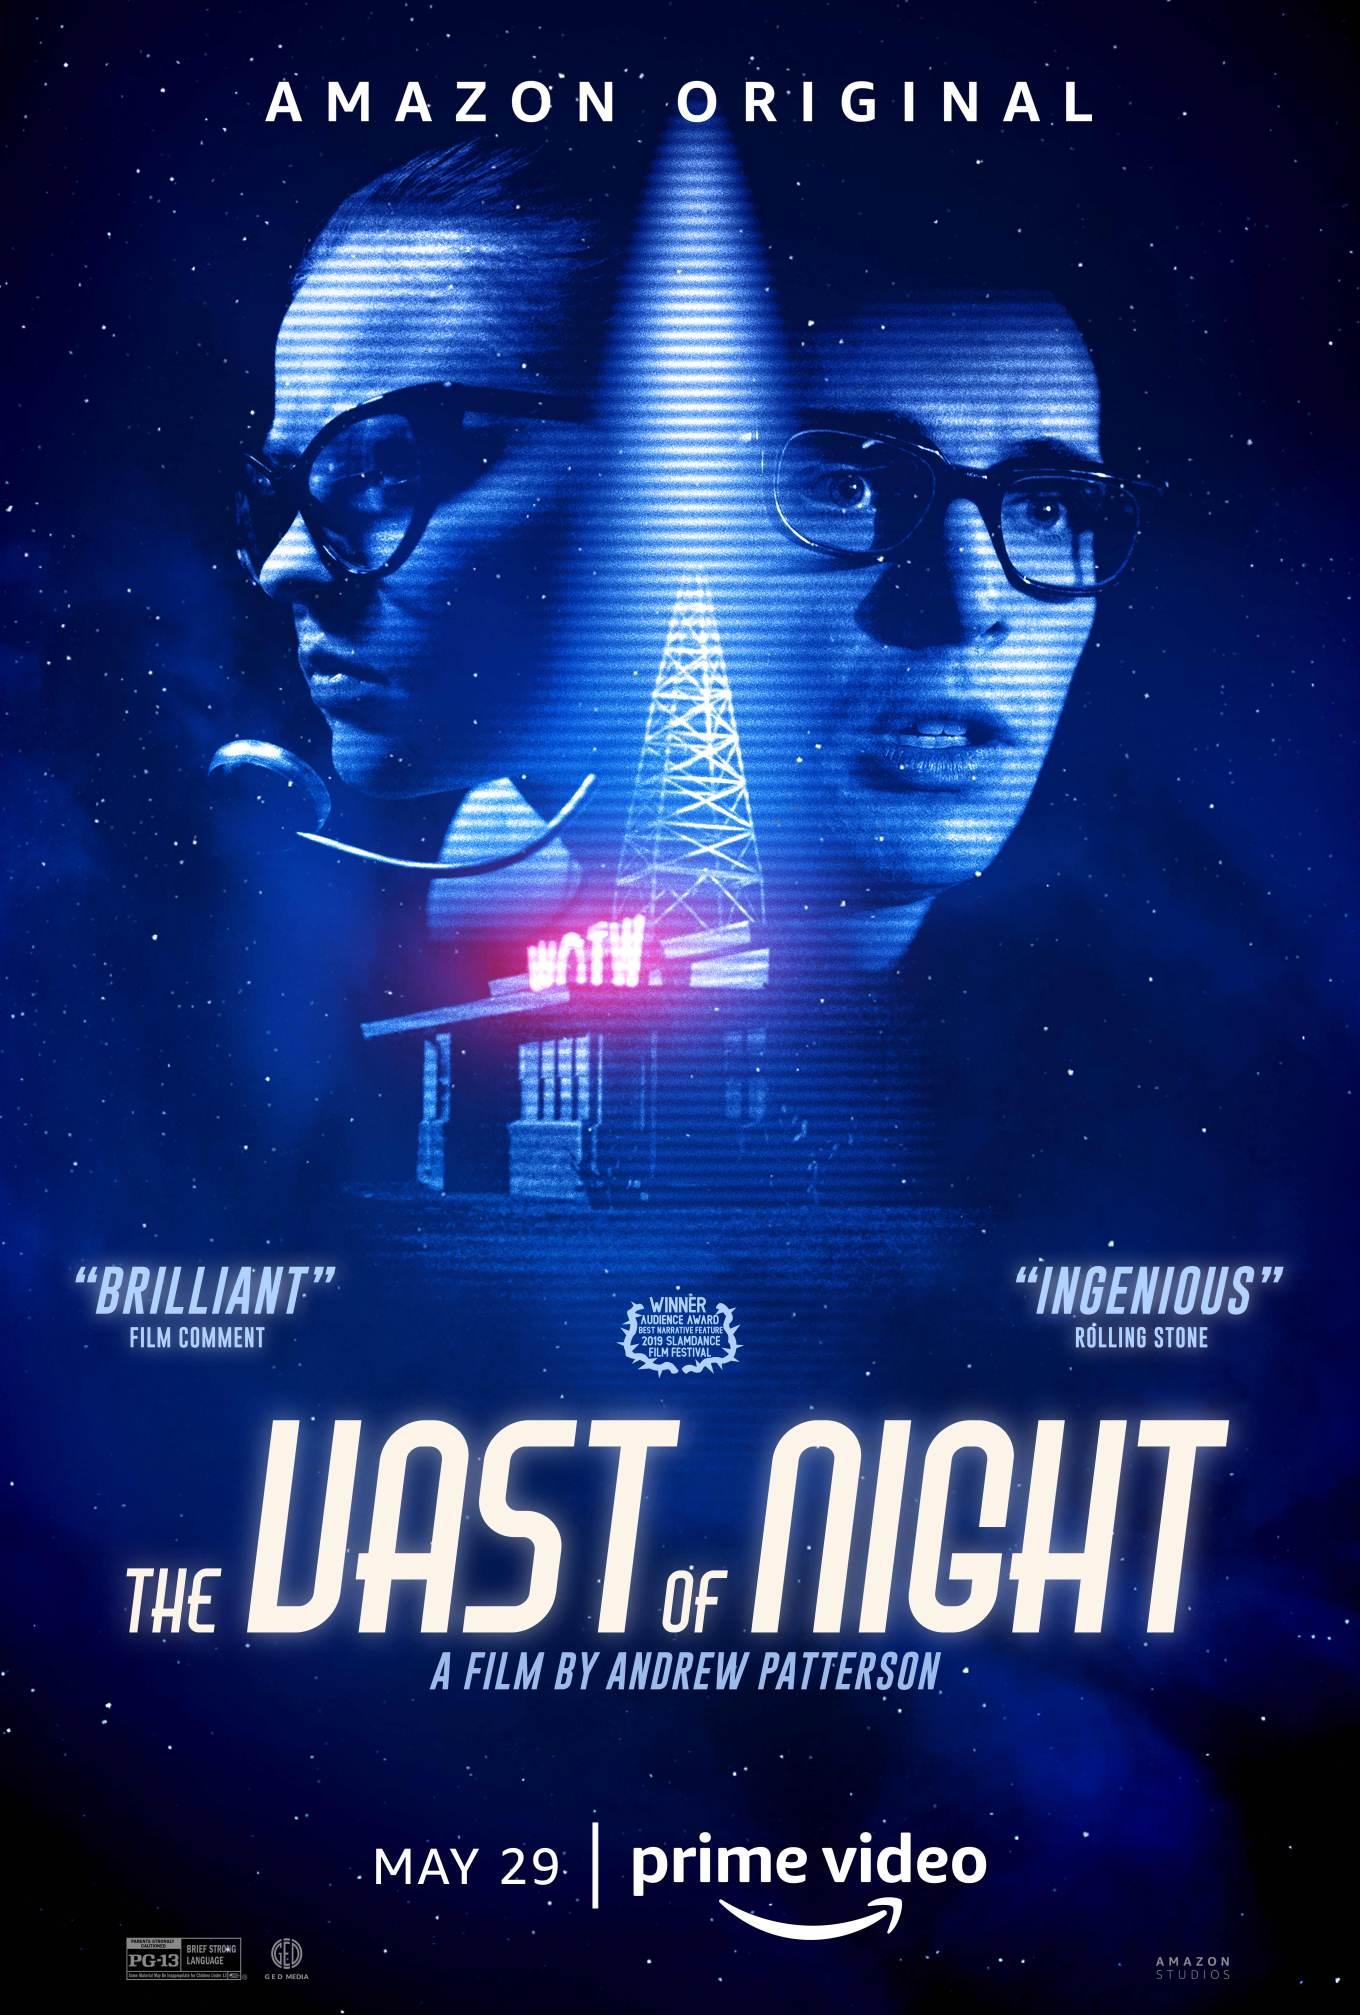 the-vast-of-night-TVON_AMZN_VerticalBuildSizes_r2_Movies_FIN_MAY29_72DPI_C_rgb